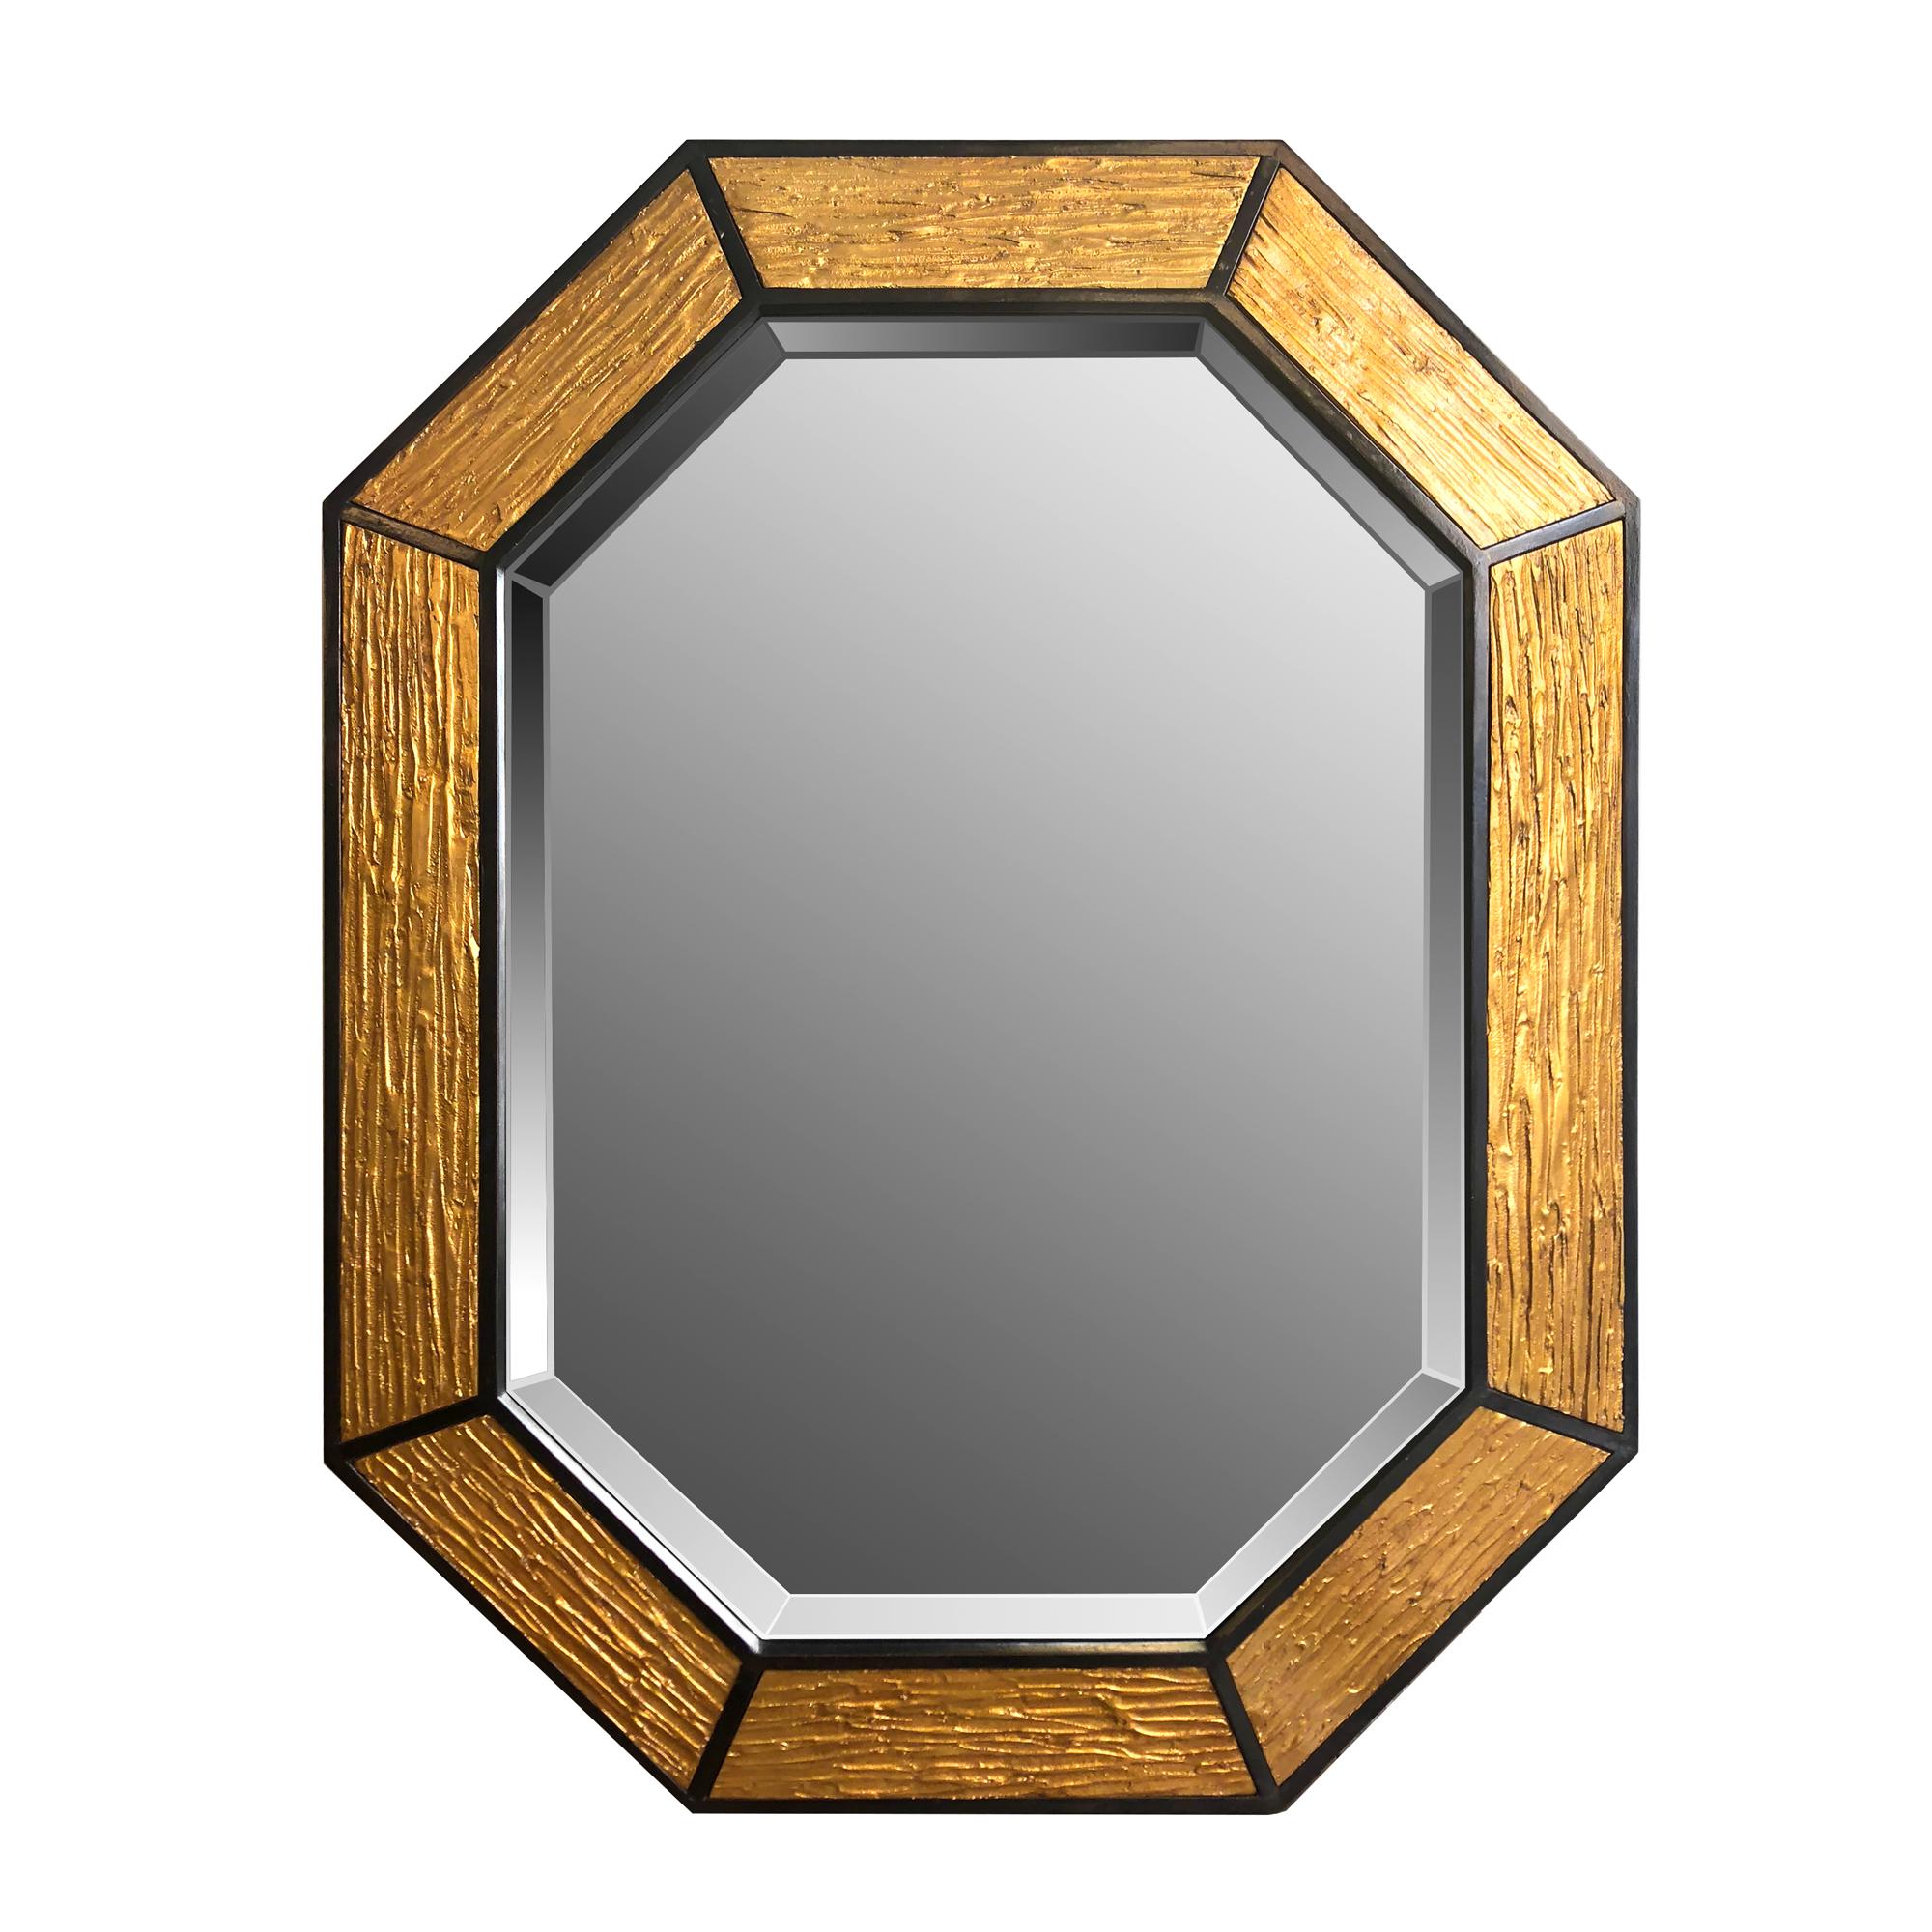 R819-Spectrum-Octagonal-Mirror-Beveled-Interchangable-Pannels-Victoria-&-Son-Custom-Order-Furniture-Antiques-Gold-Spackled.jpg